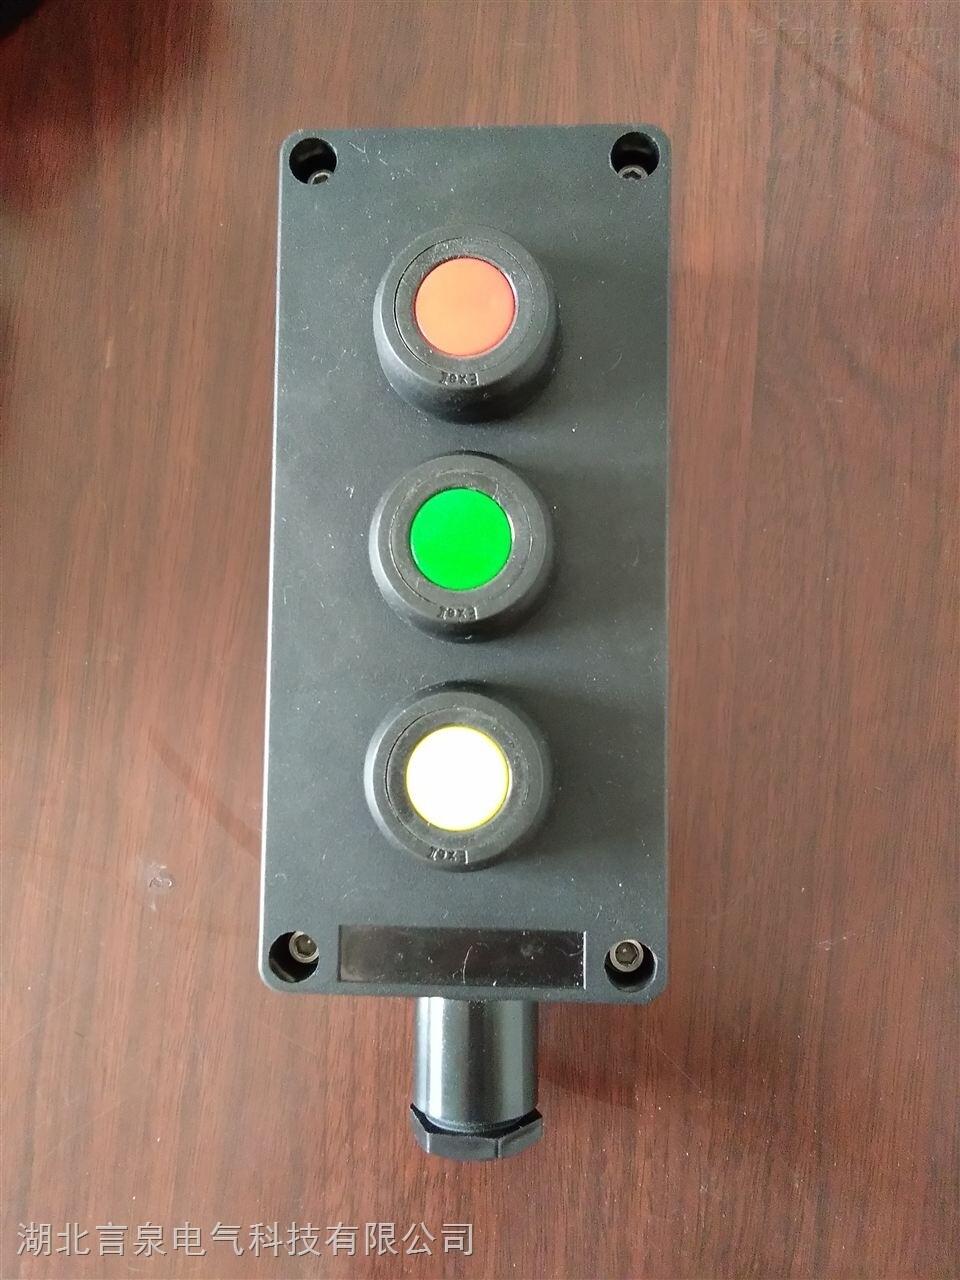 BZA8050-A3防爆防腐主令控制器适用范围 *1、适用于爆炸性气体环境1区、2区;2、适用于iia、iib、iic级爆炸性气体环境; *2、适用于温度组别为t1-t6的环境; *3、用于电气控制系统中,作为指令发送及状态监视之用; *4、方案多样,可根据用户提供的电气系统图进行生产。 主要技术参数 *1.